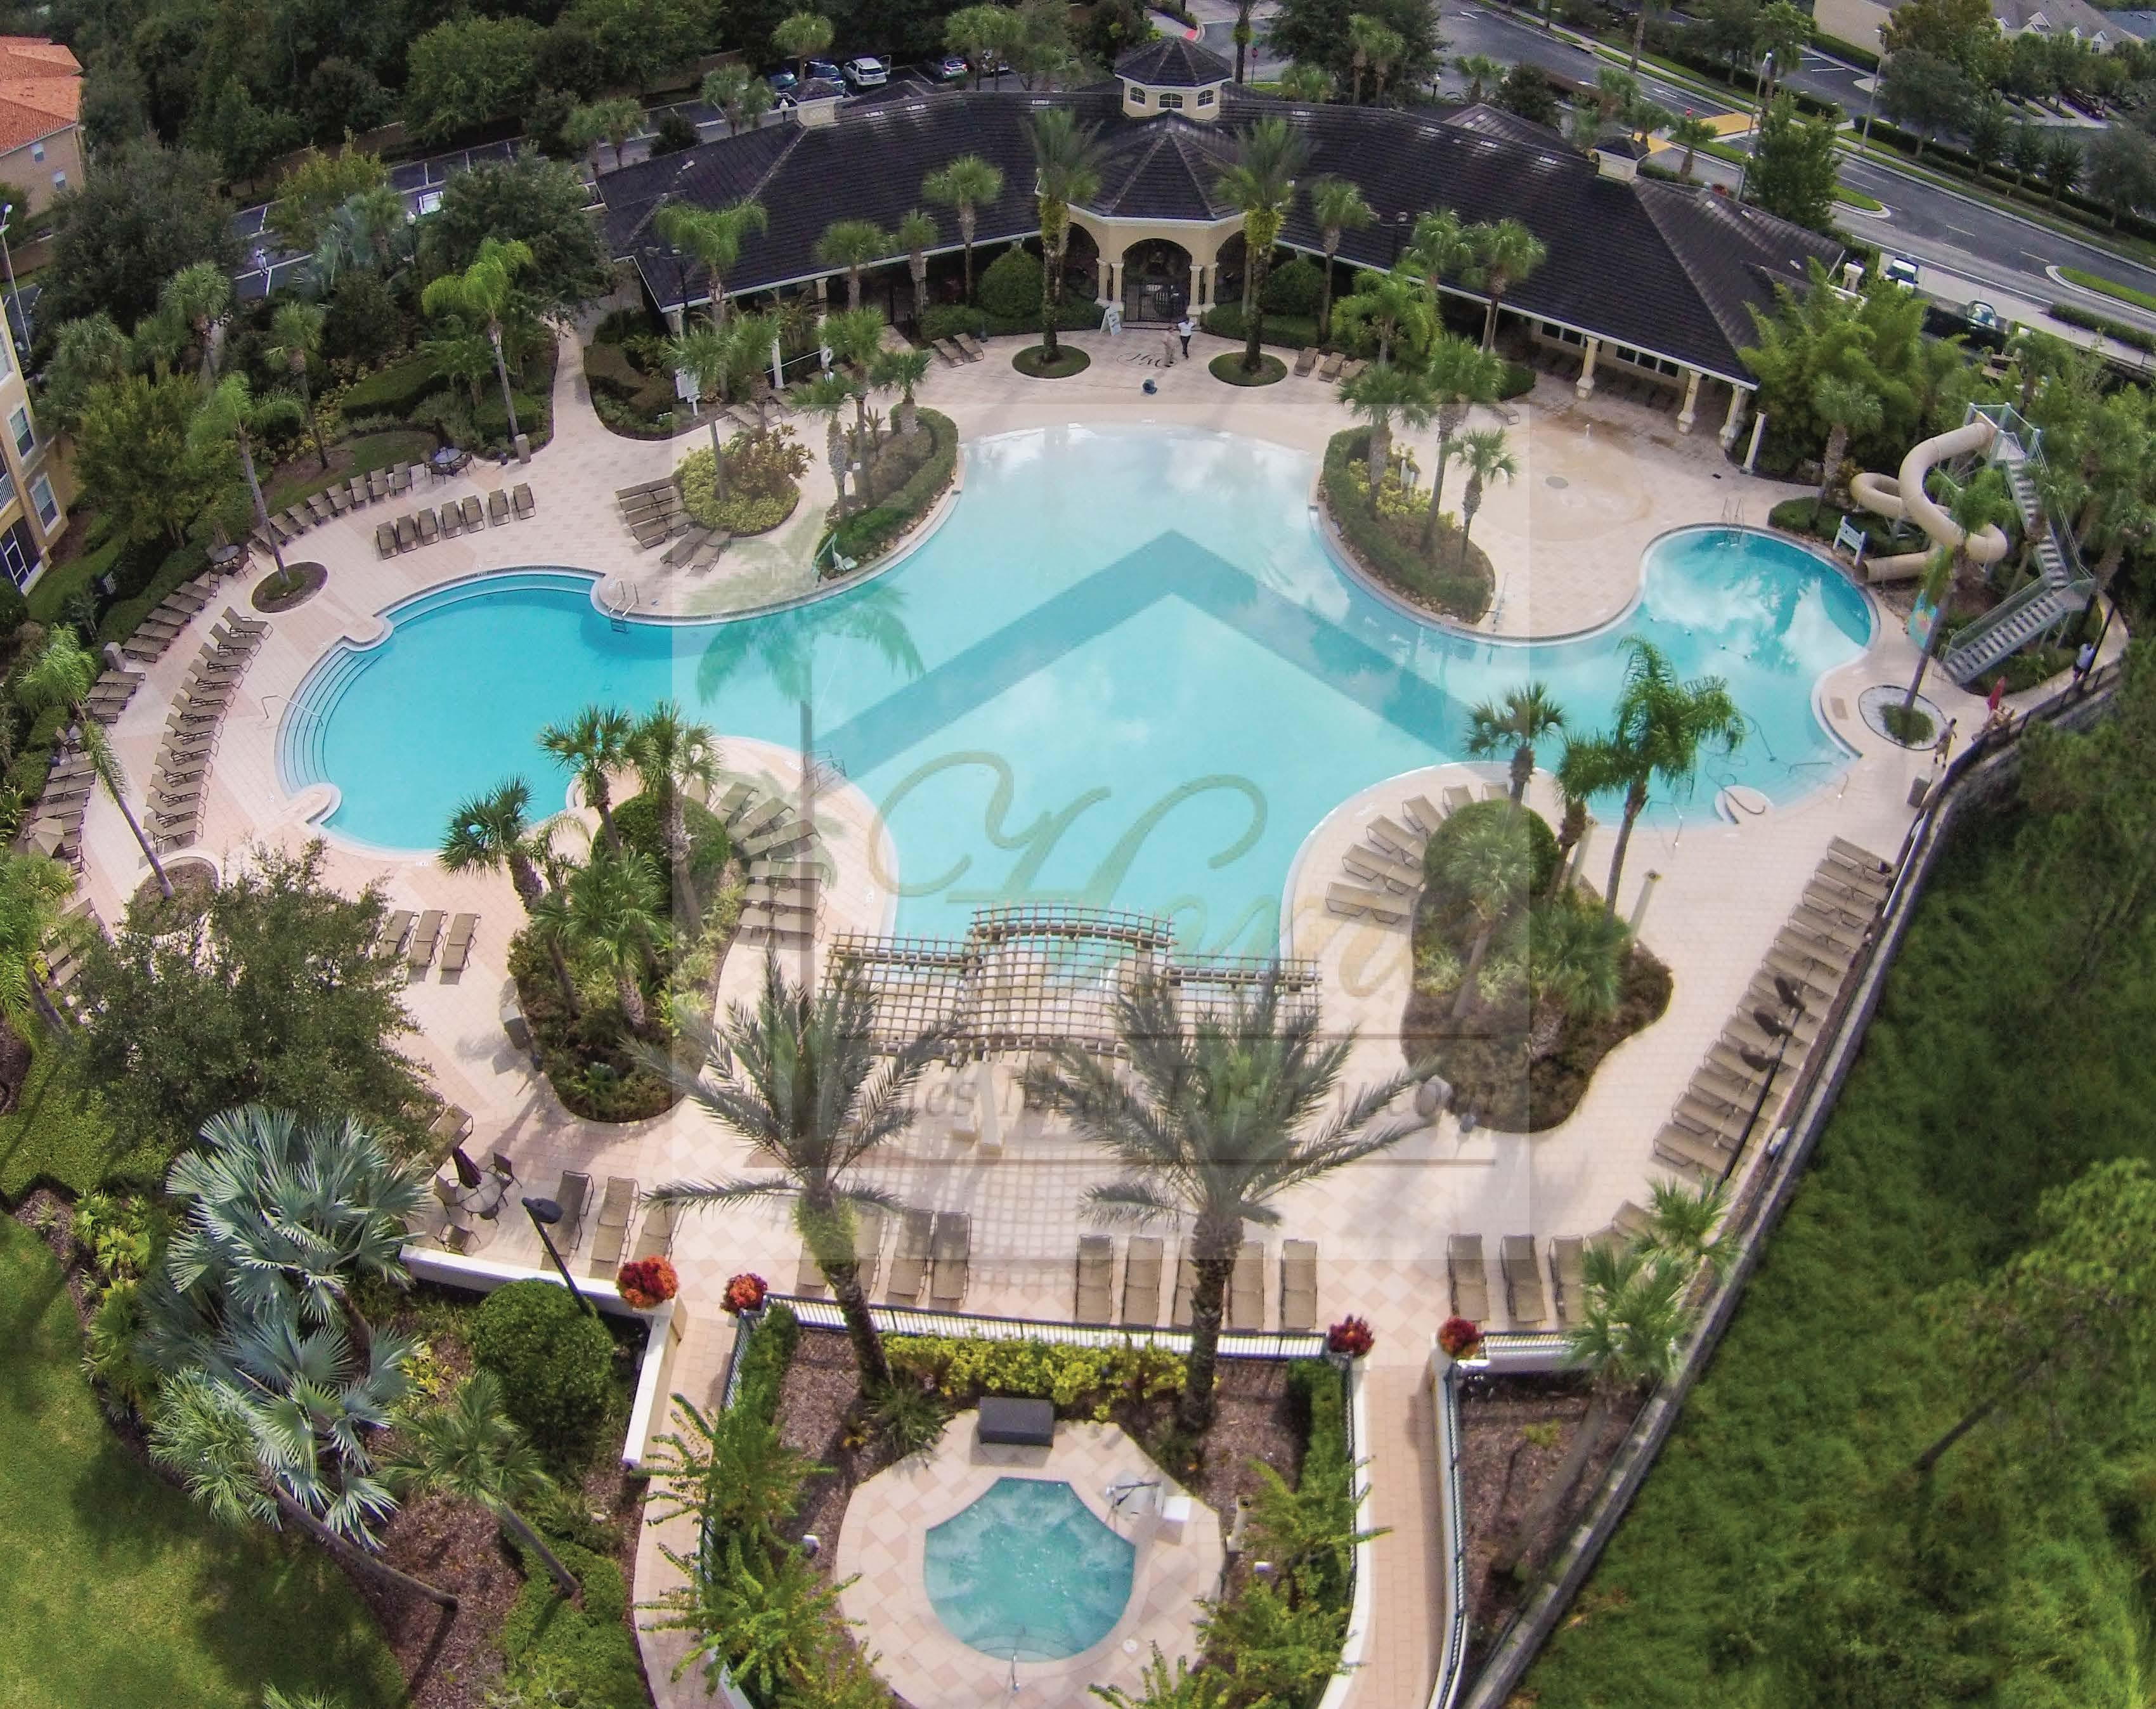 Real Estate For Sale Windsor Hills Vacation Homes For